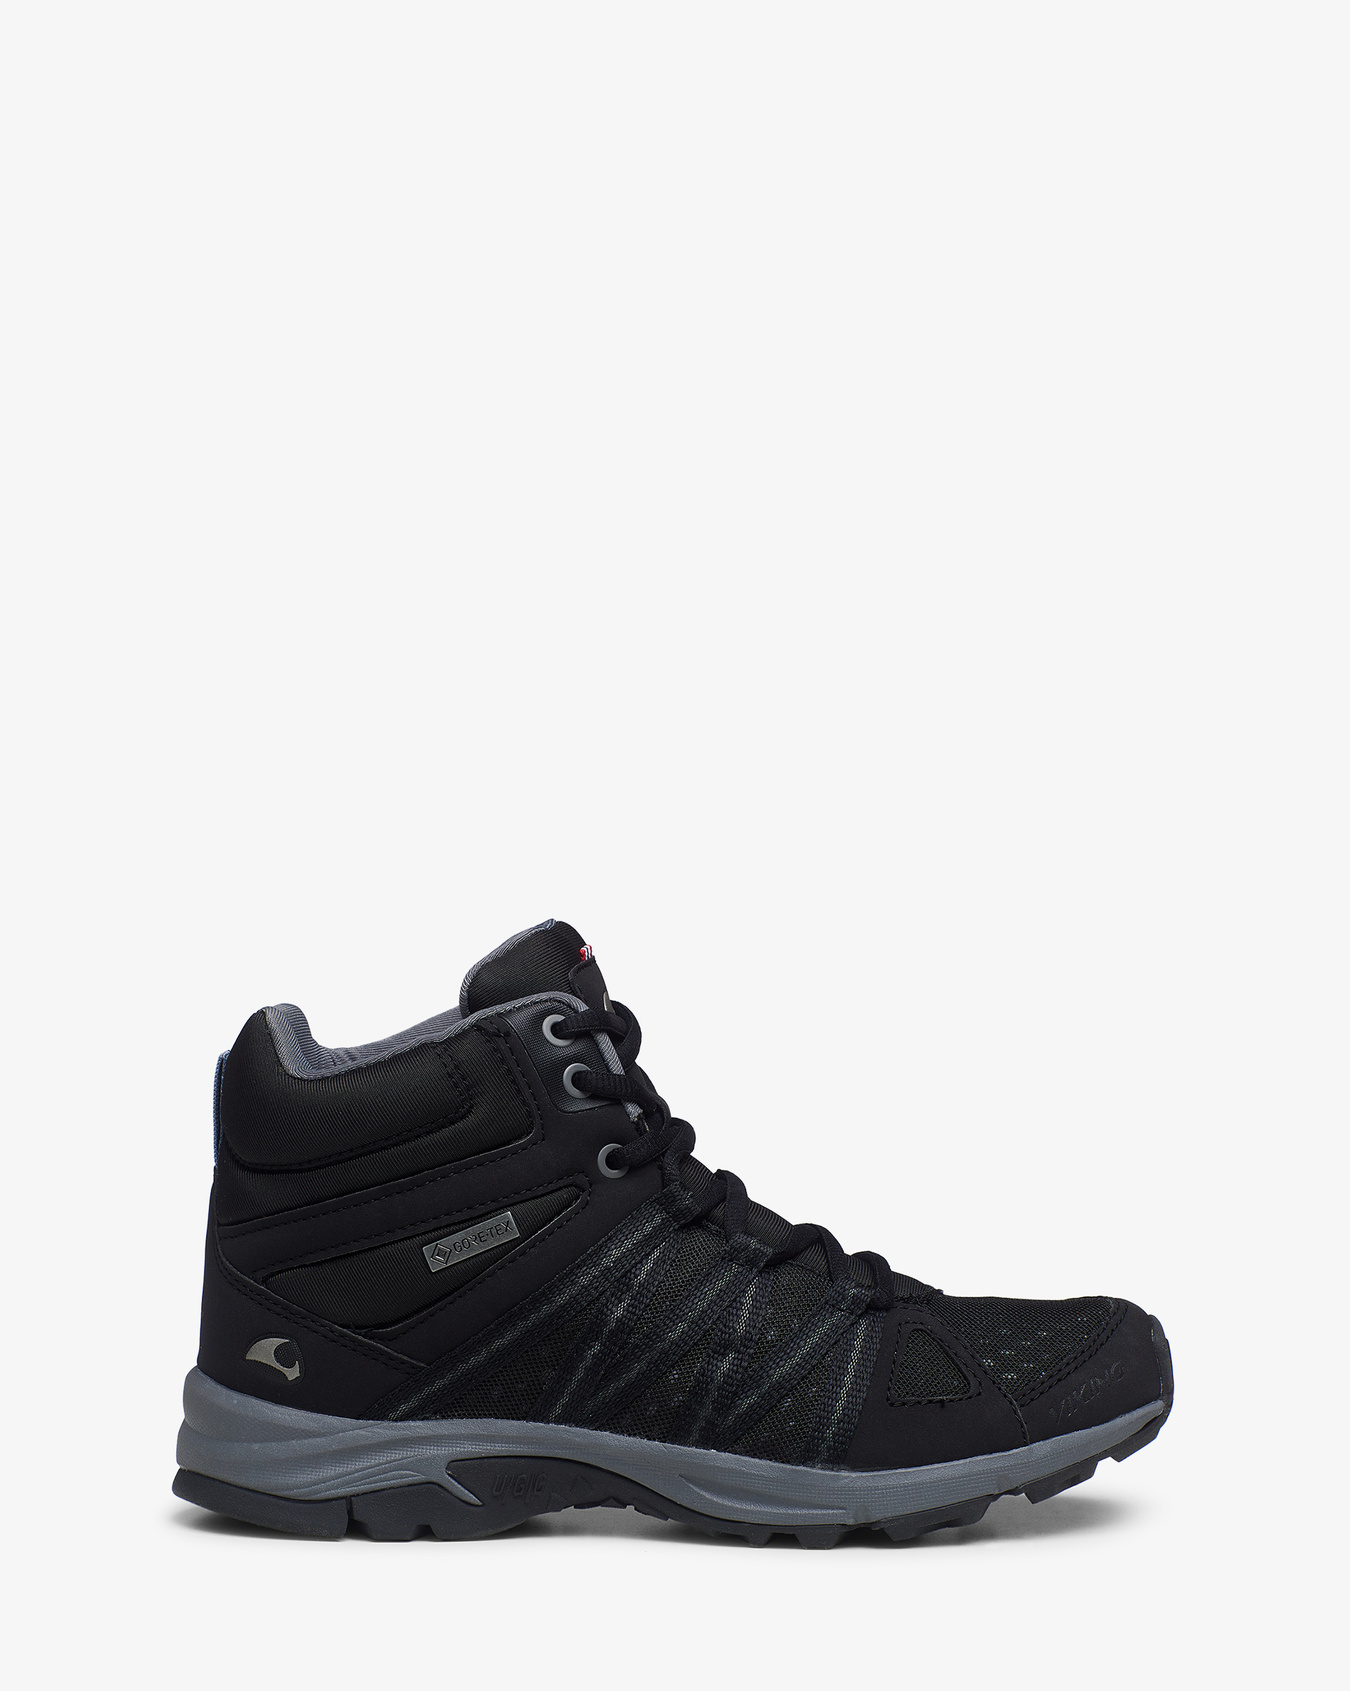 Day Mid GTX W Walking Shoe